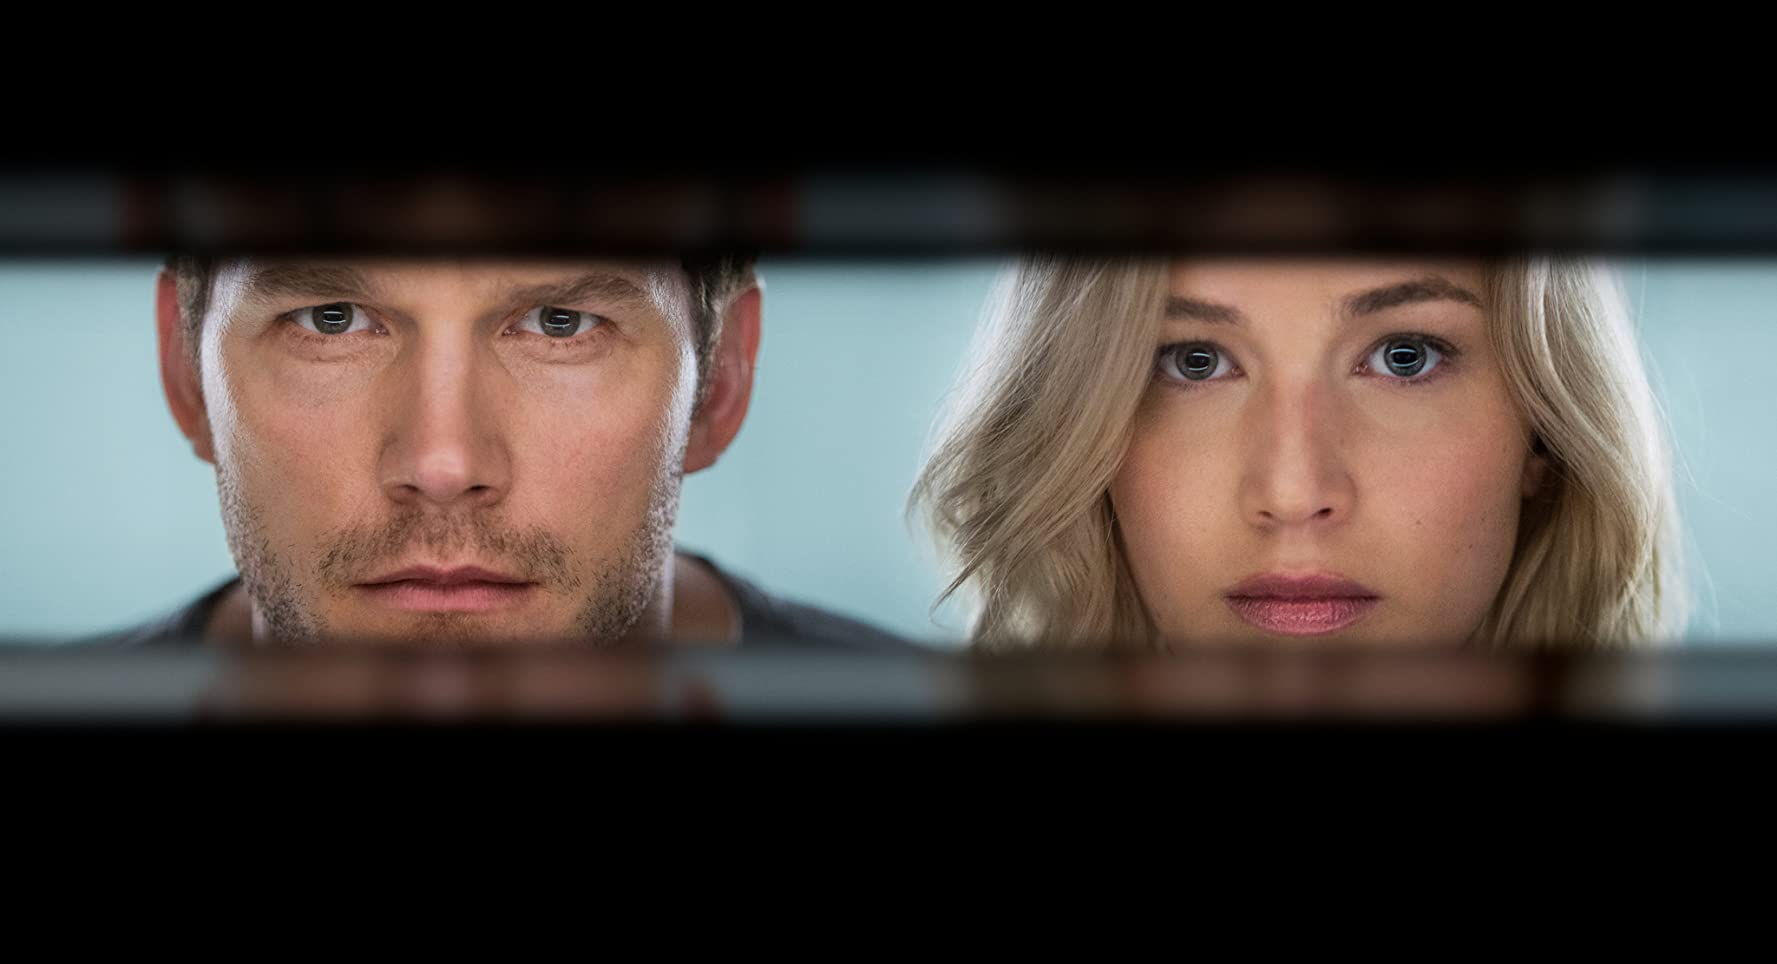 Chris Pratt and Jennifer Lawrence in Passengers (2016)